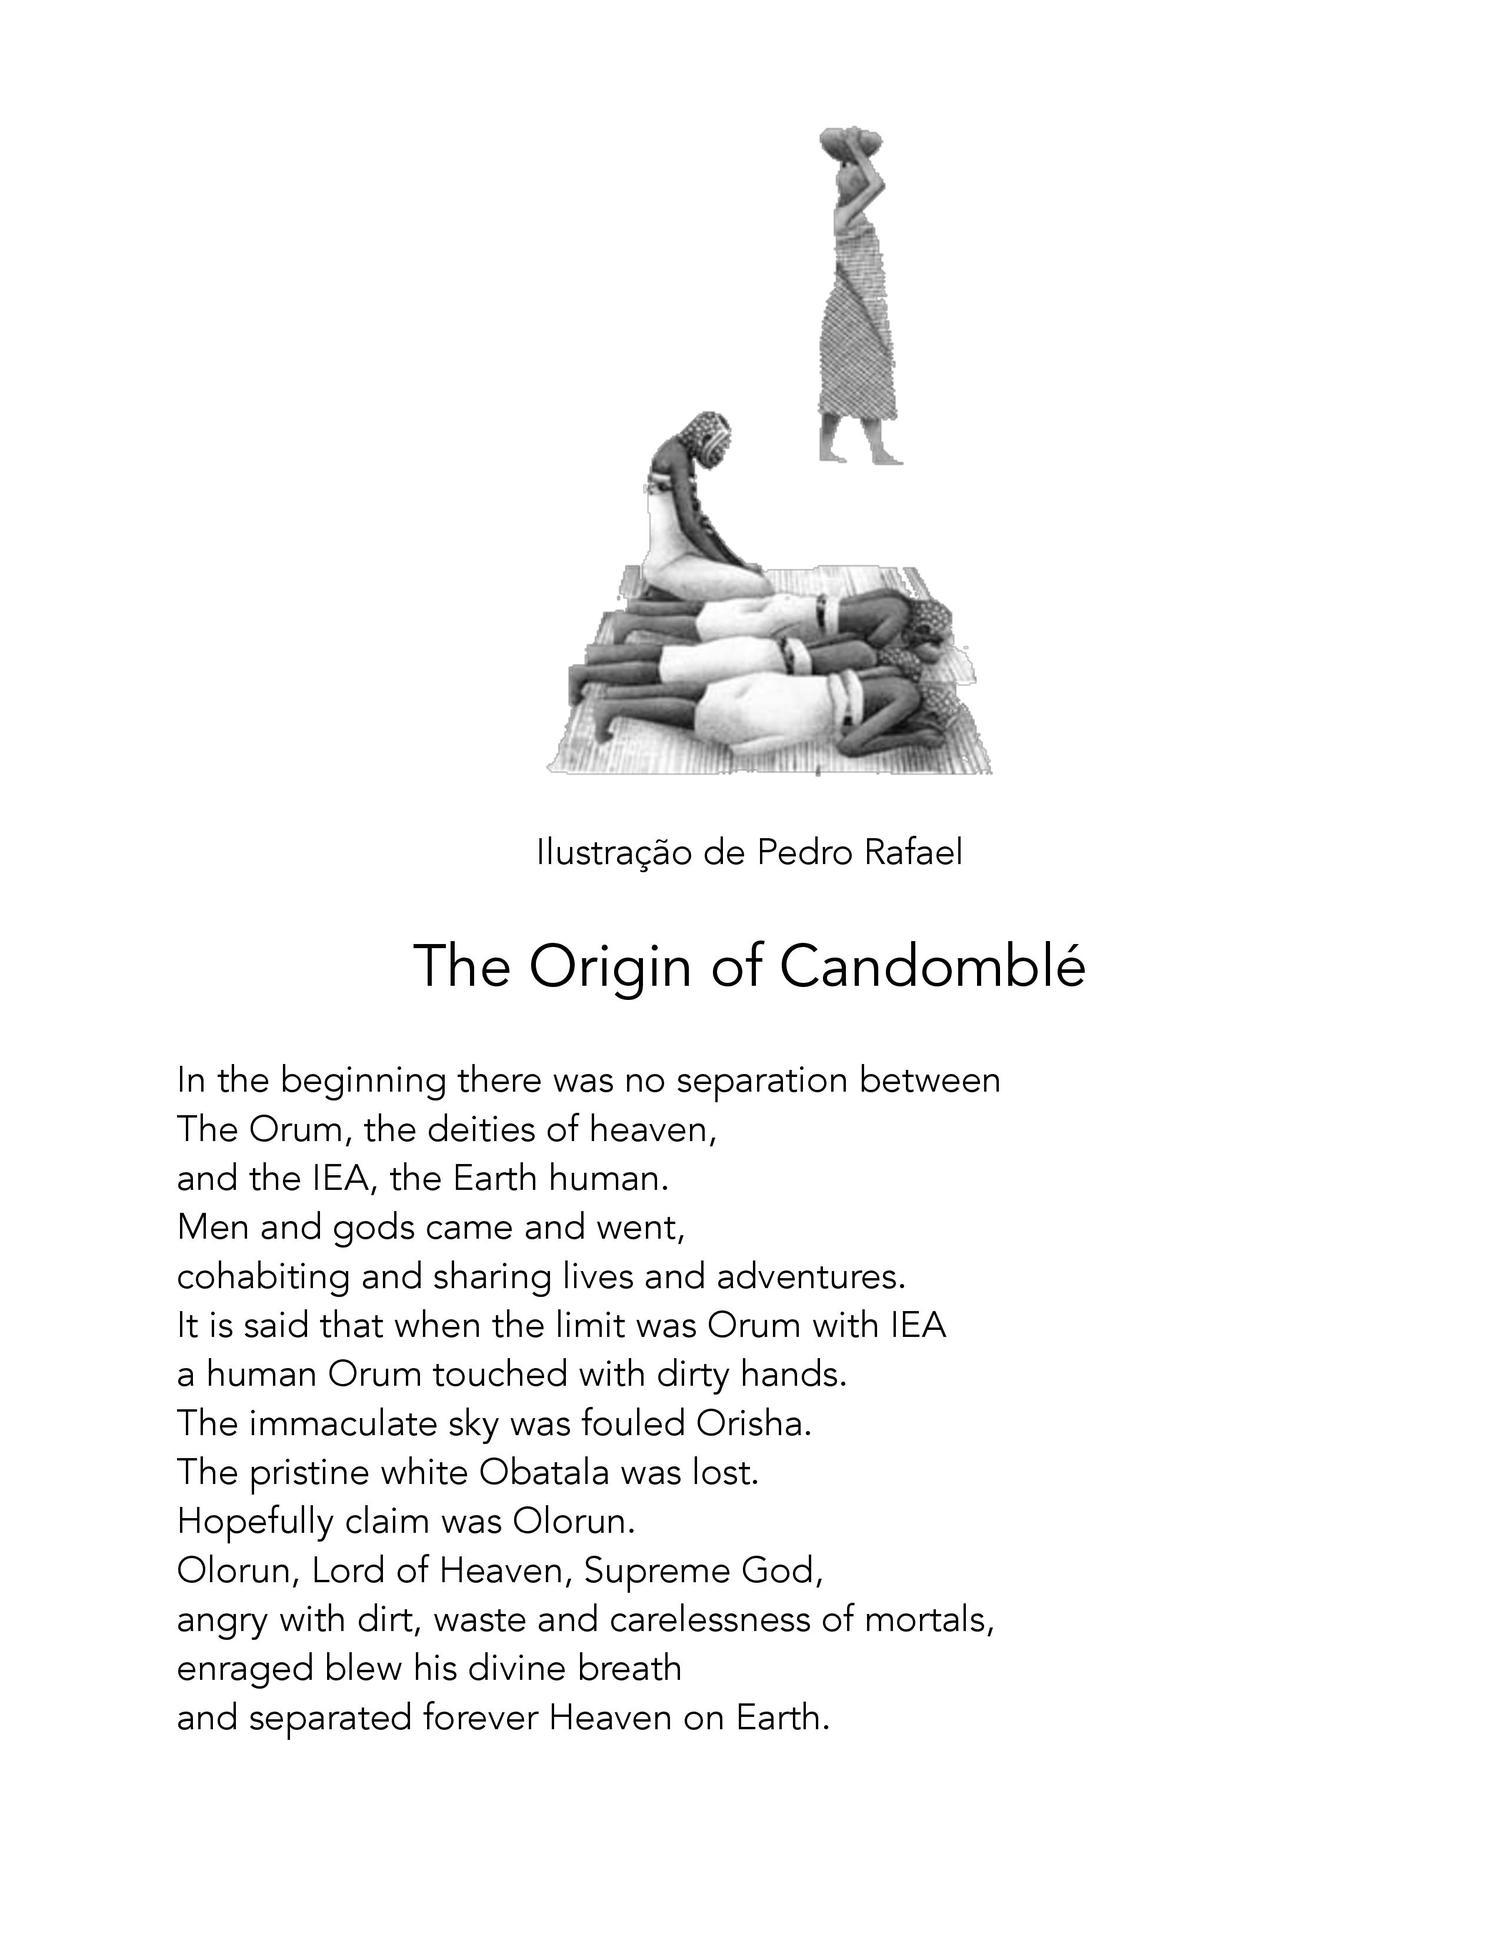 The+Origin+of+Candomble+-+Reginaldo+Prandi-page-001.jpg